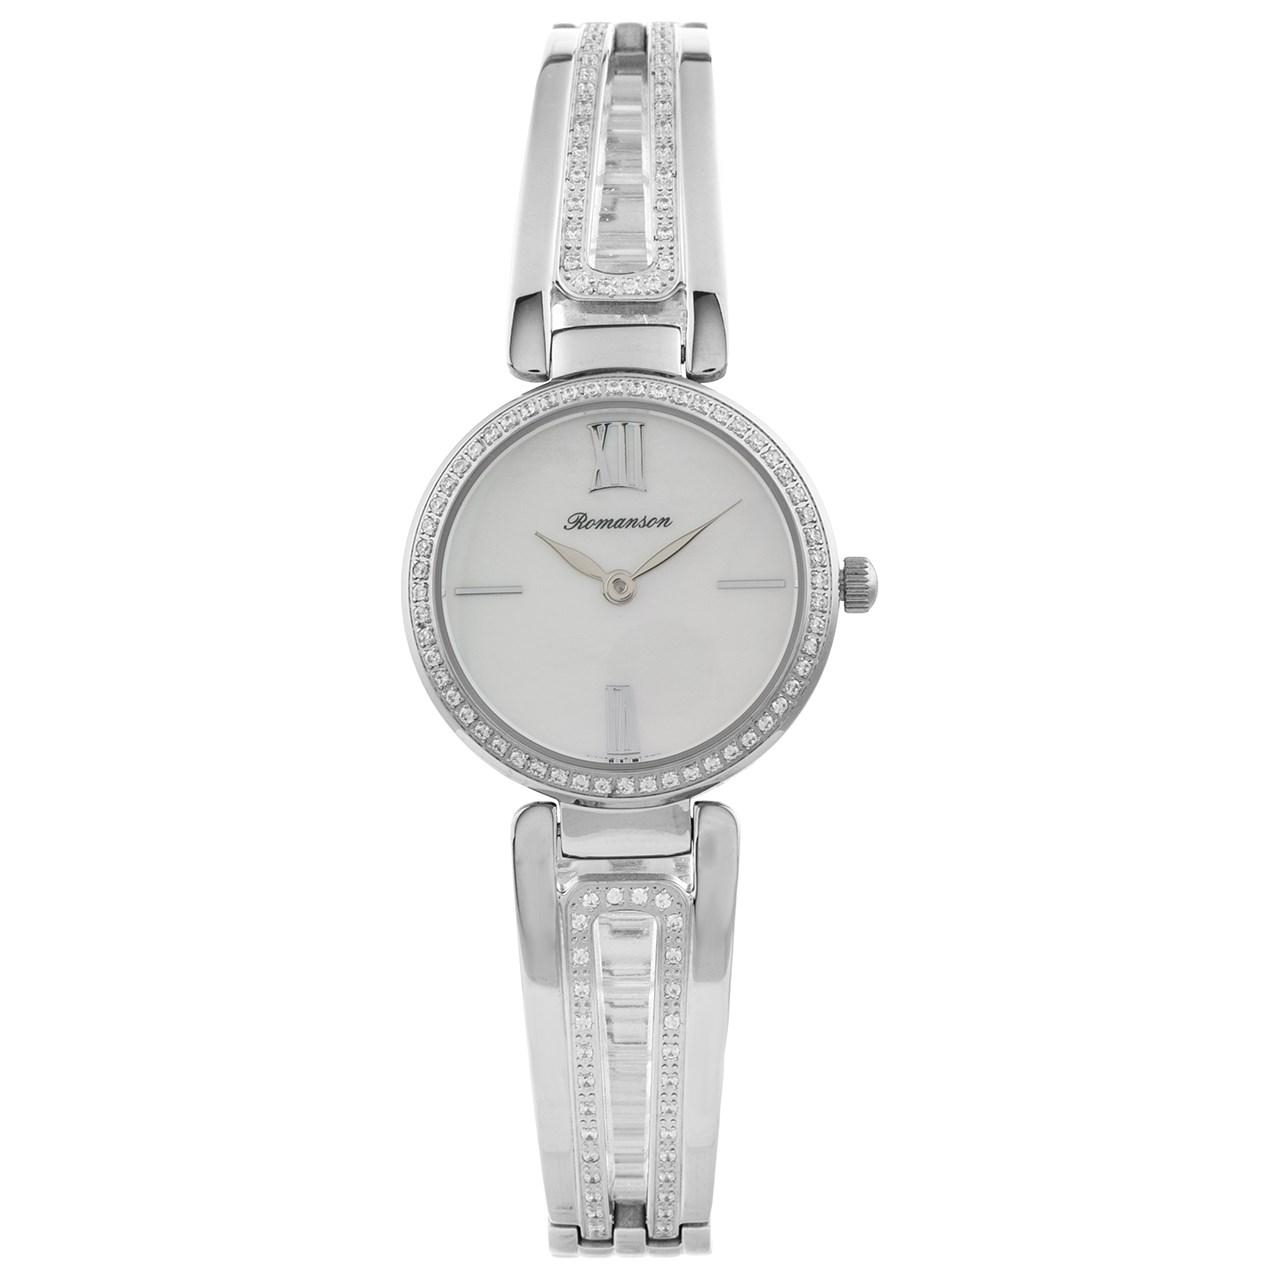 ساعت مچی عقربه ای زنانه رومانسون مدل RM7A02QLWWM1R1